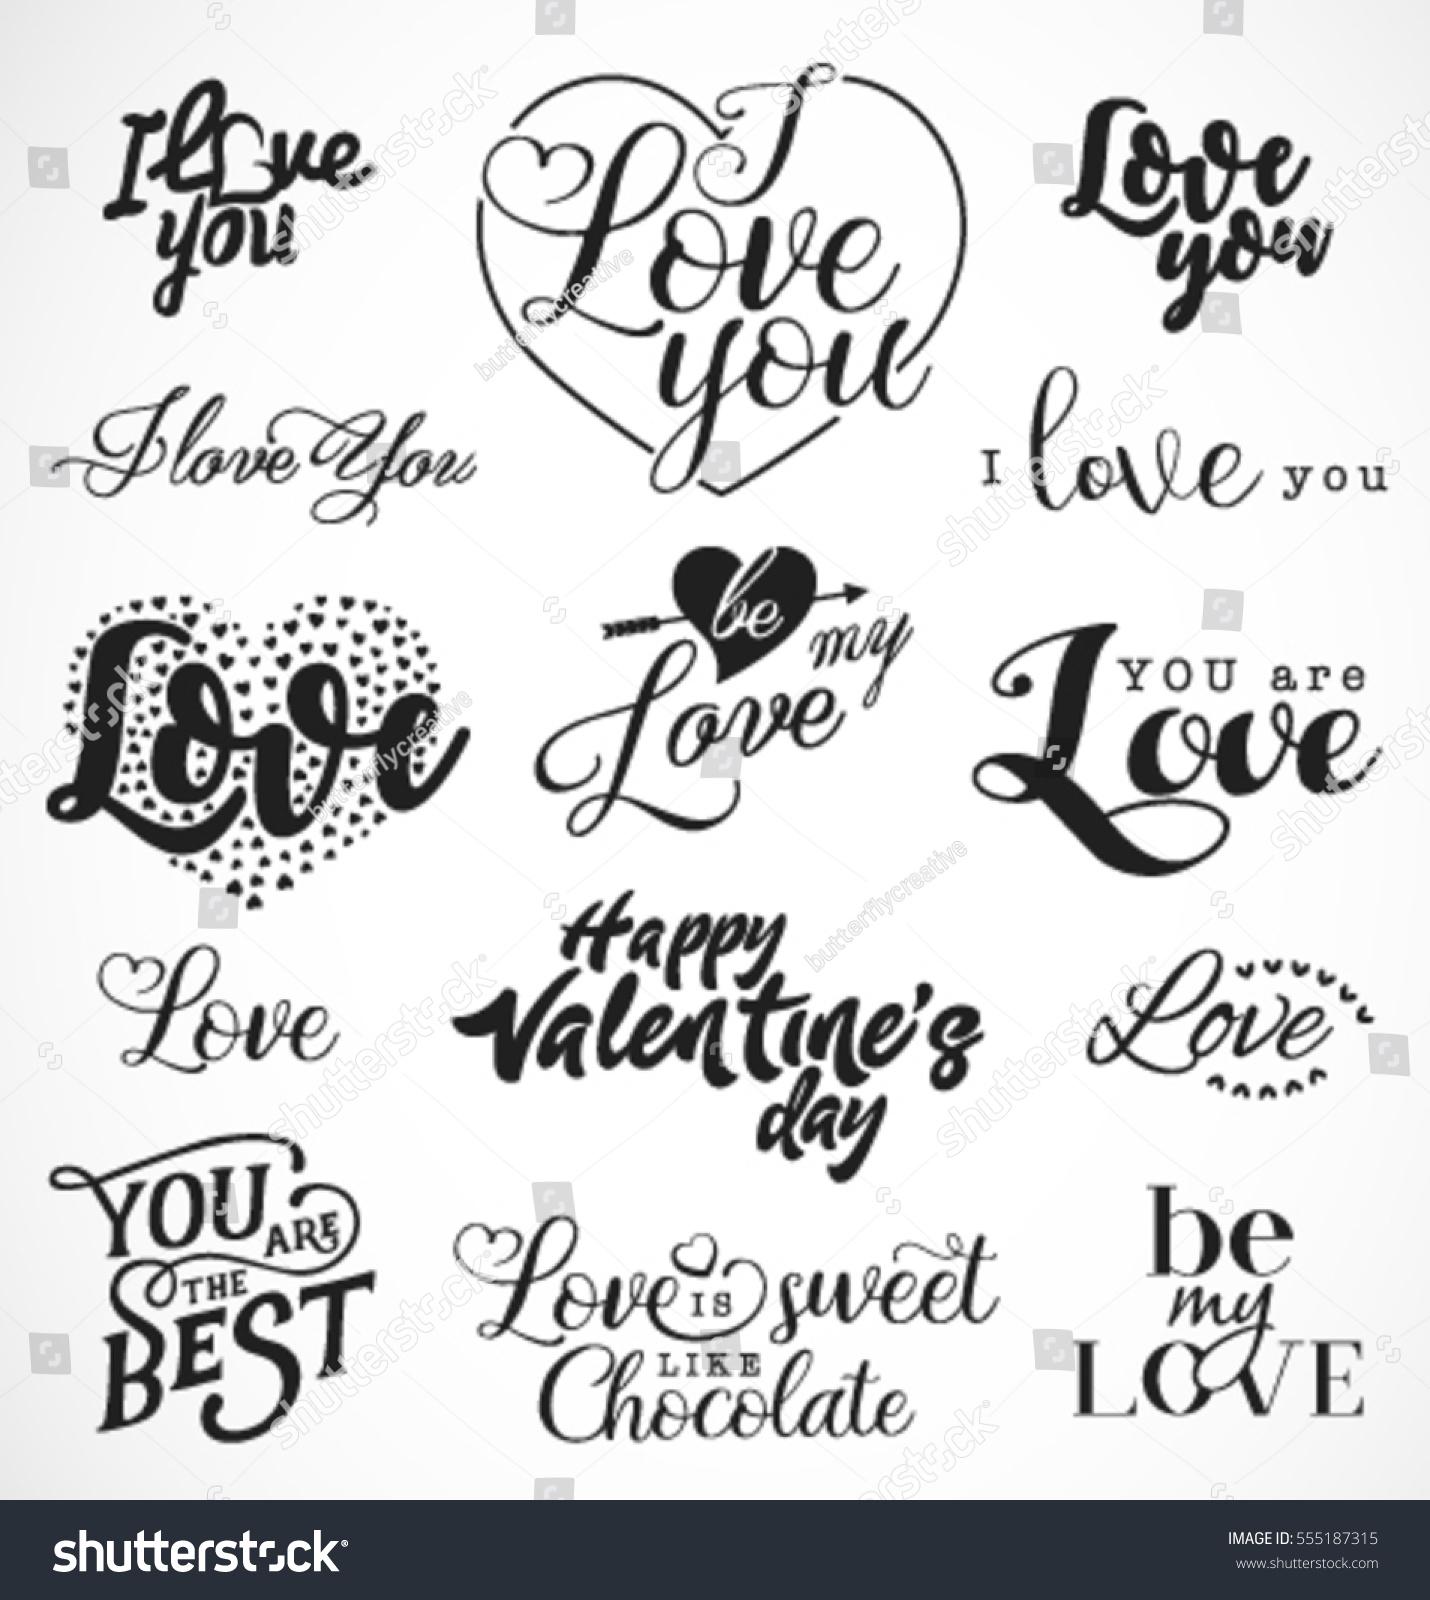 Valentines Day Black White Typography Design Stock Vector Royalty